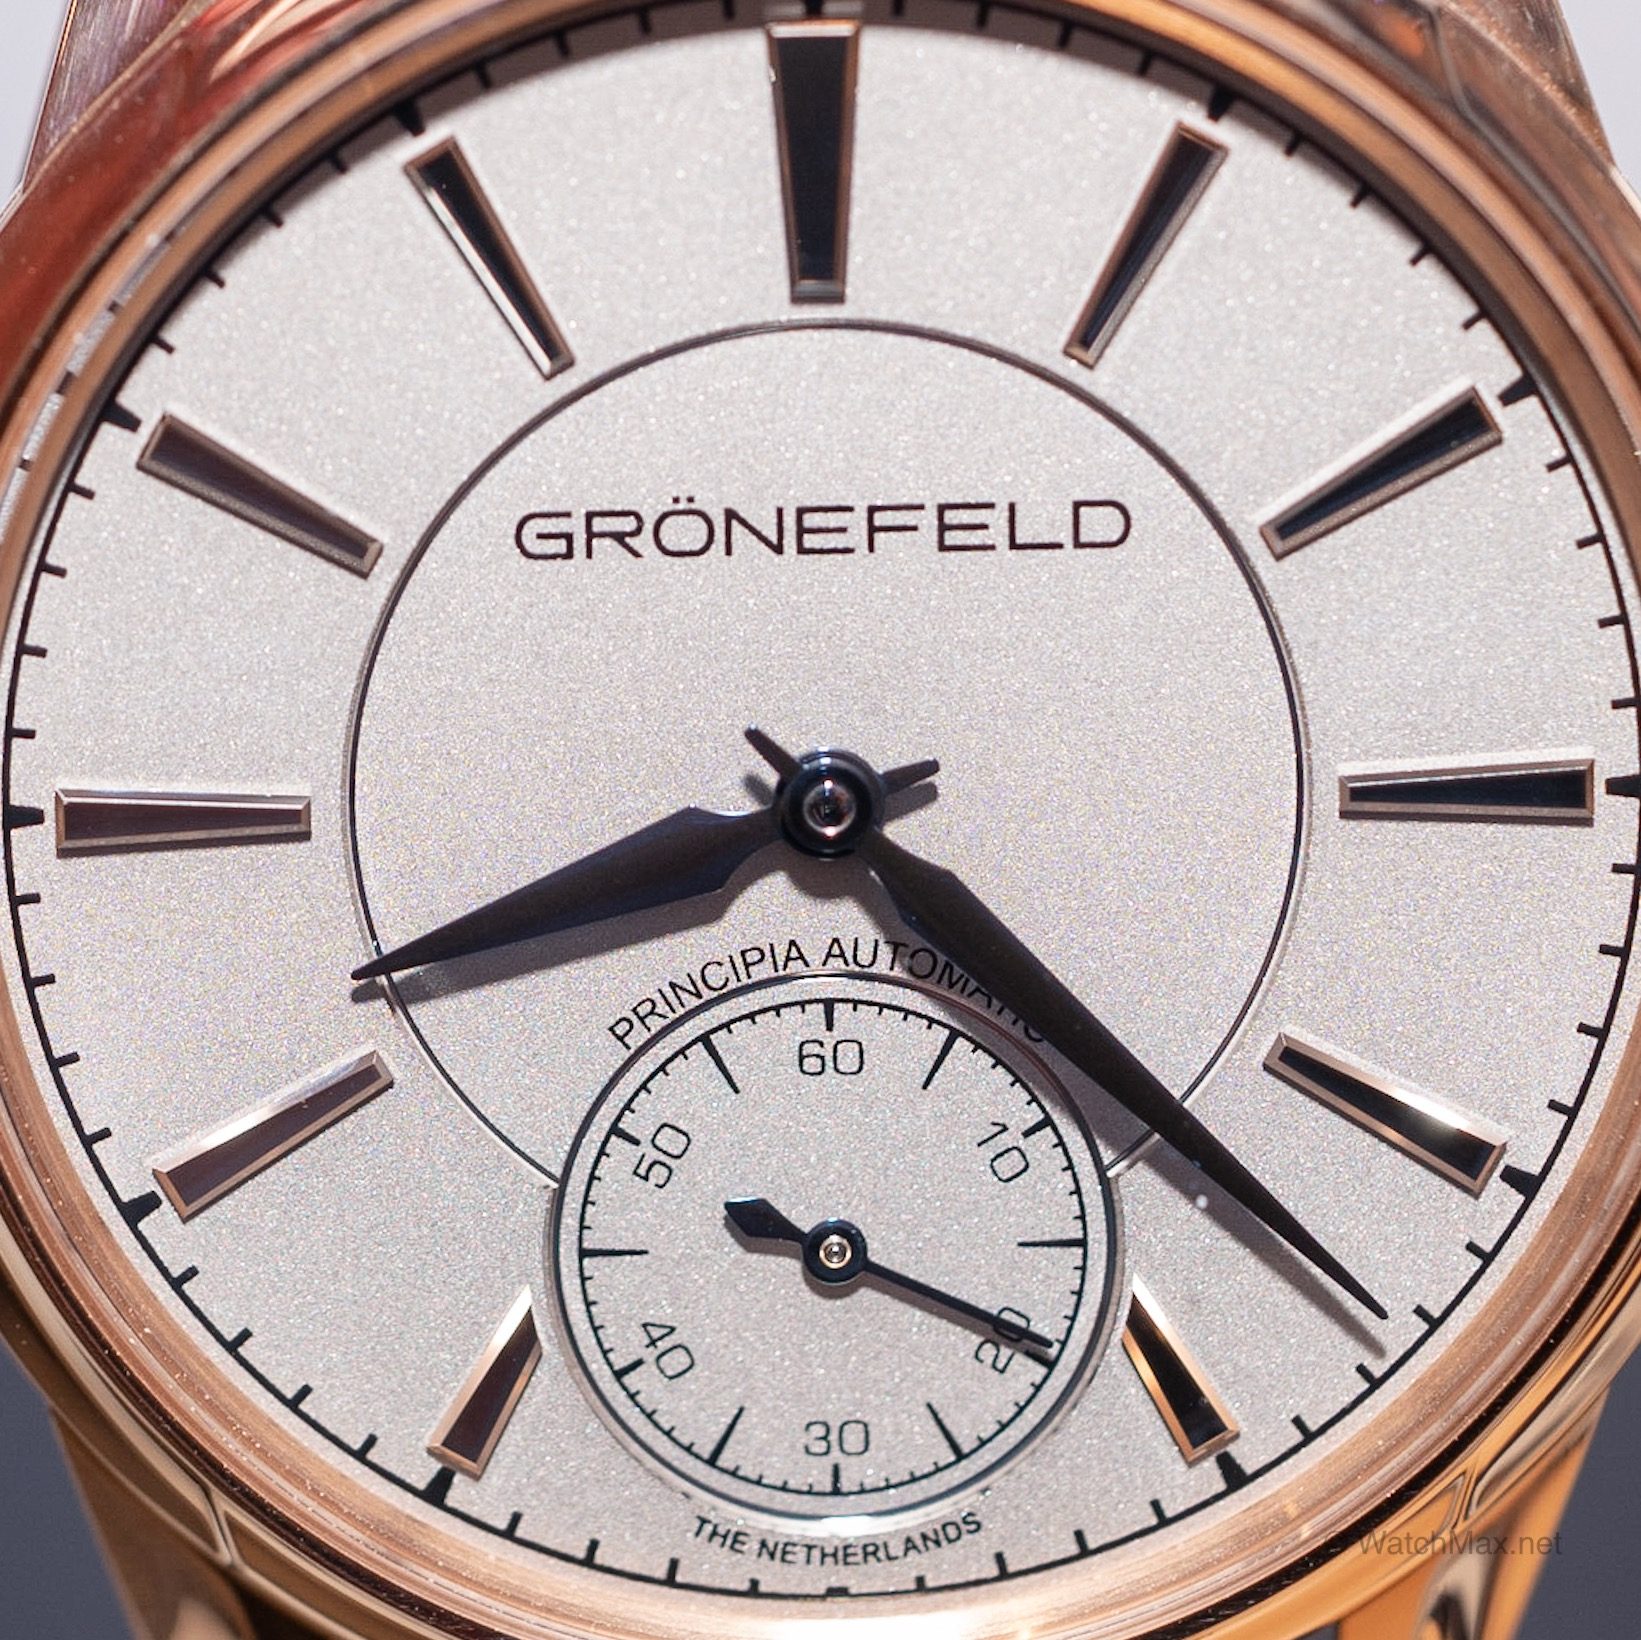 gronefeld-principia-watch-sihh-2019-4.jpg